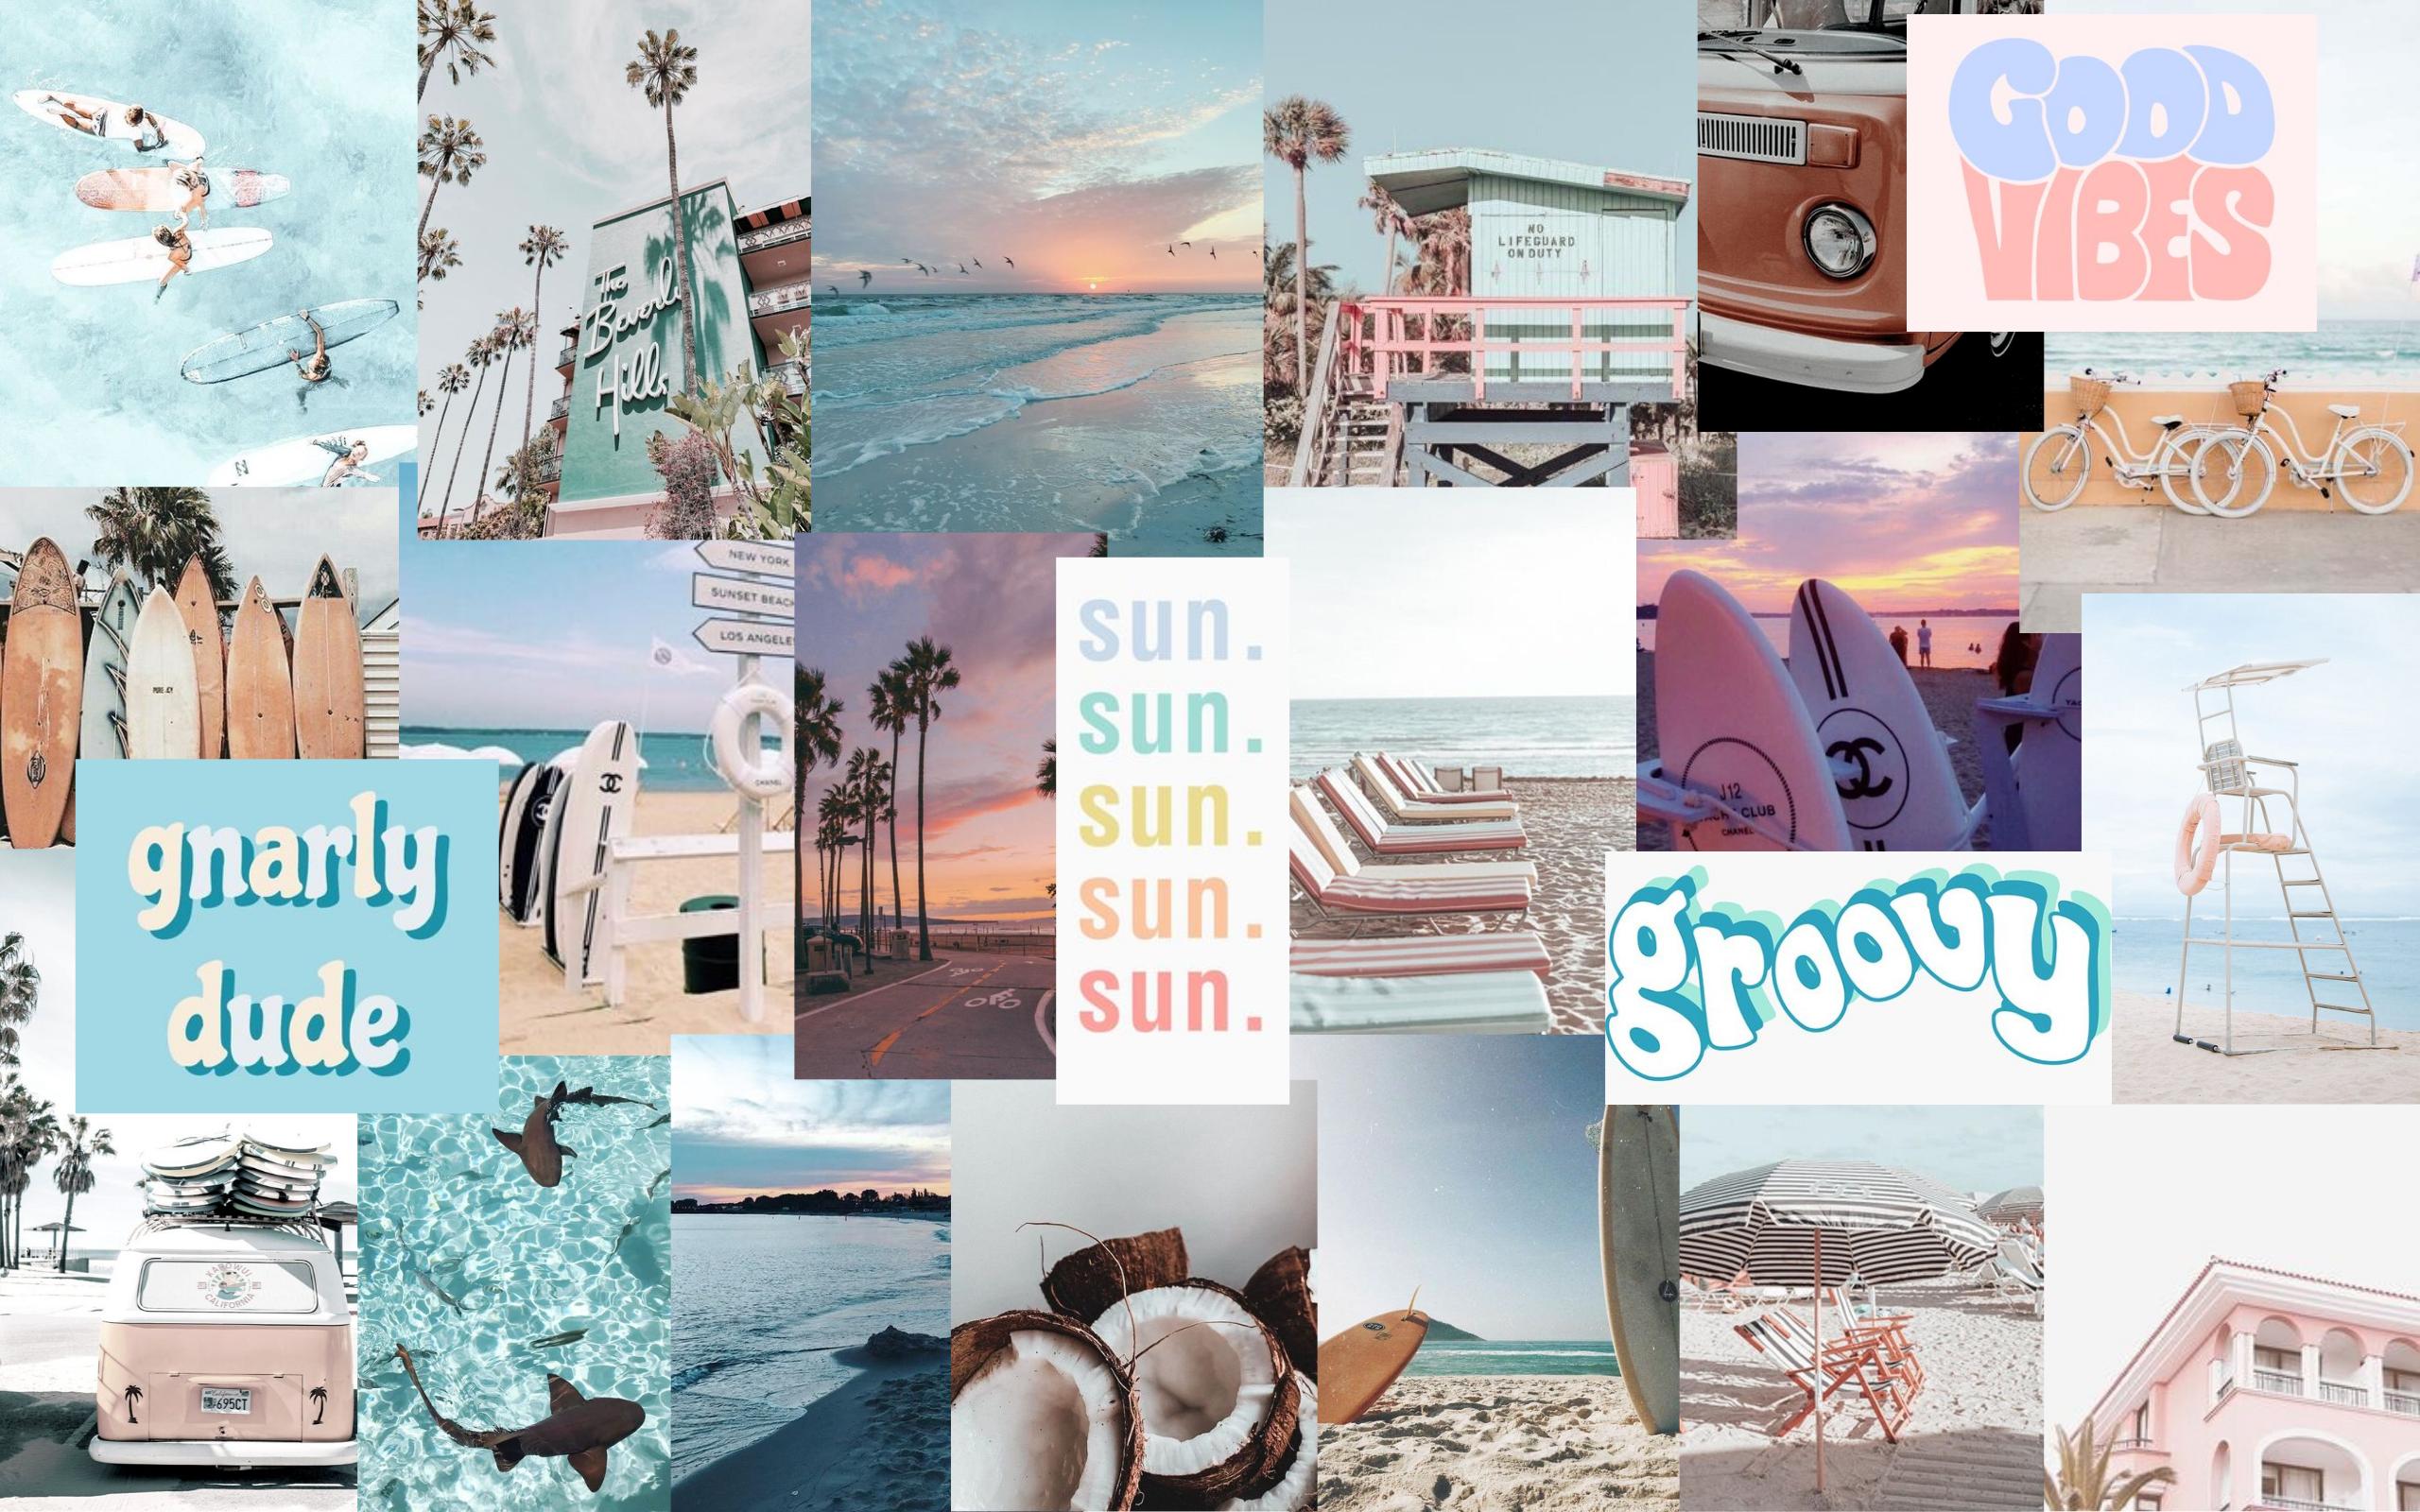 beach aesthetic wallpaper in 2020 Aesthetic desktop